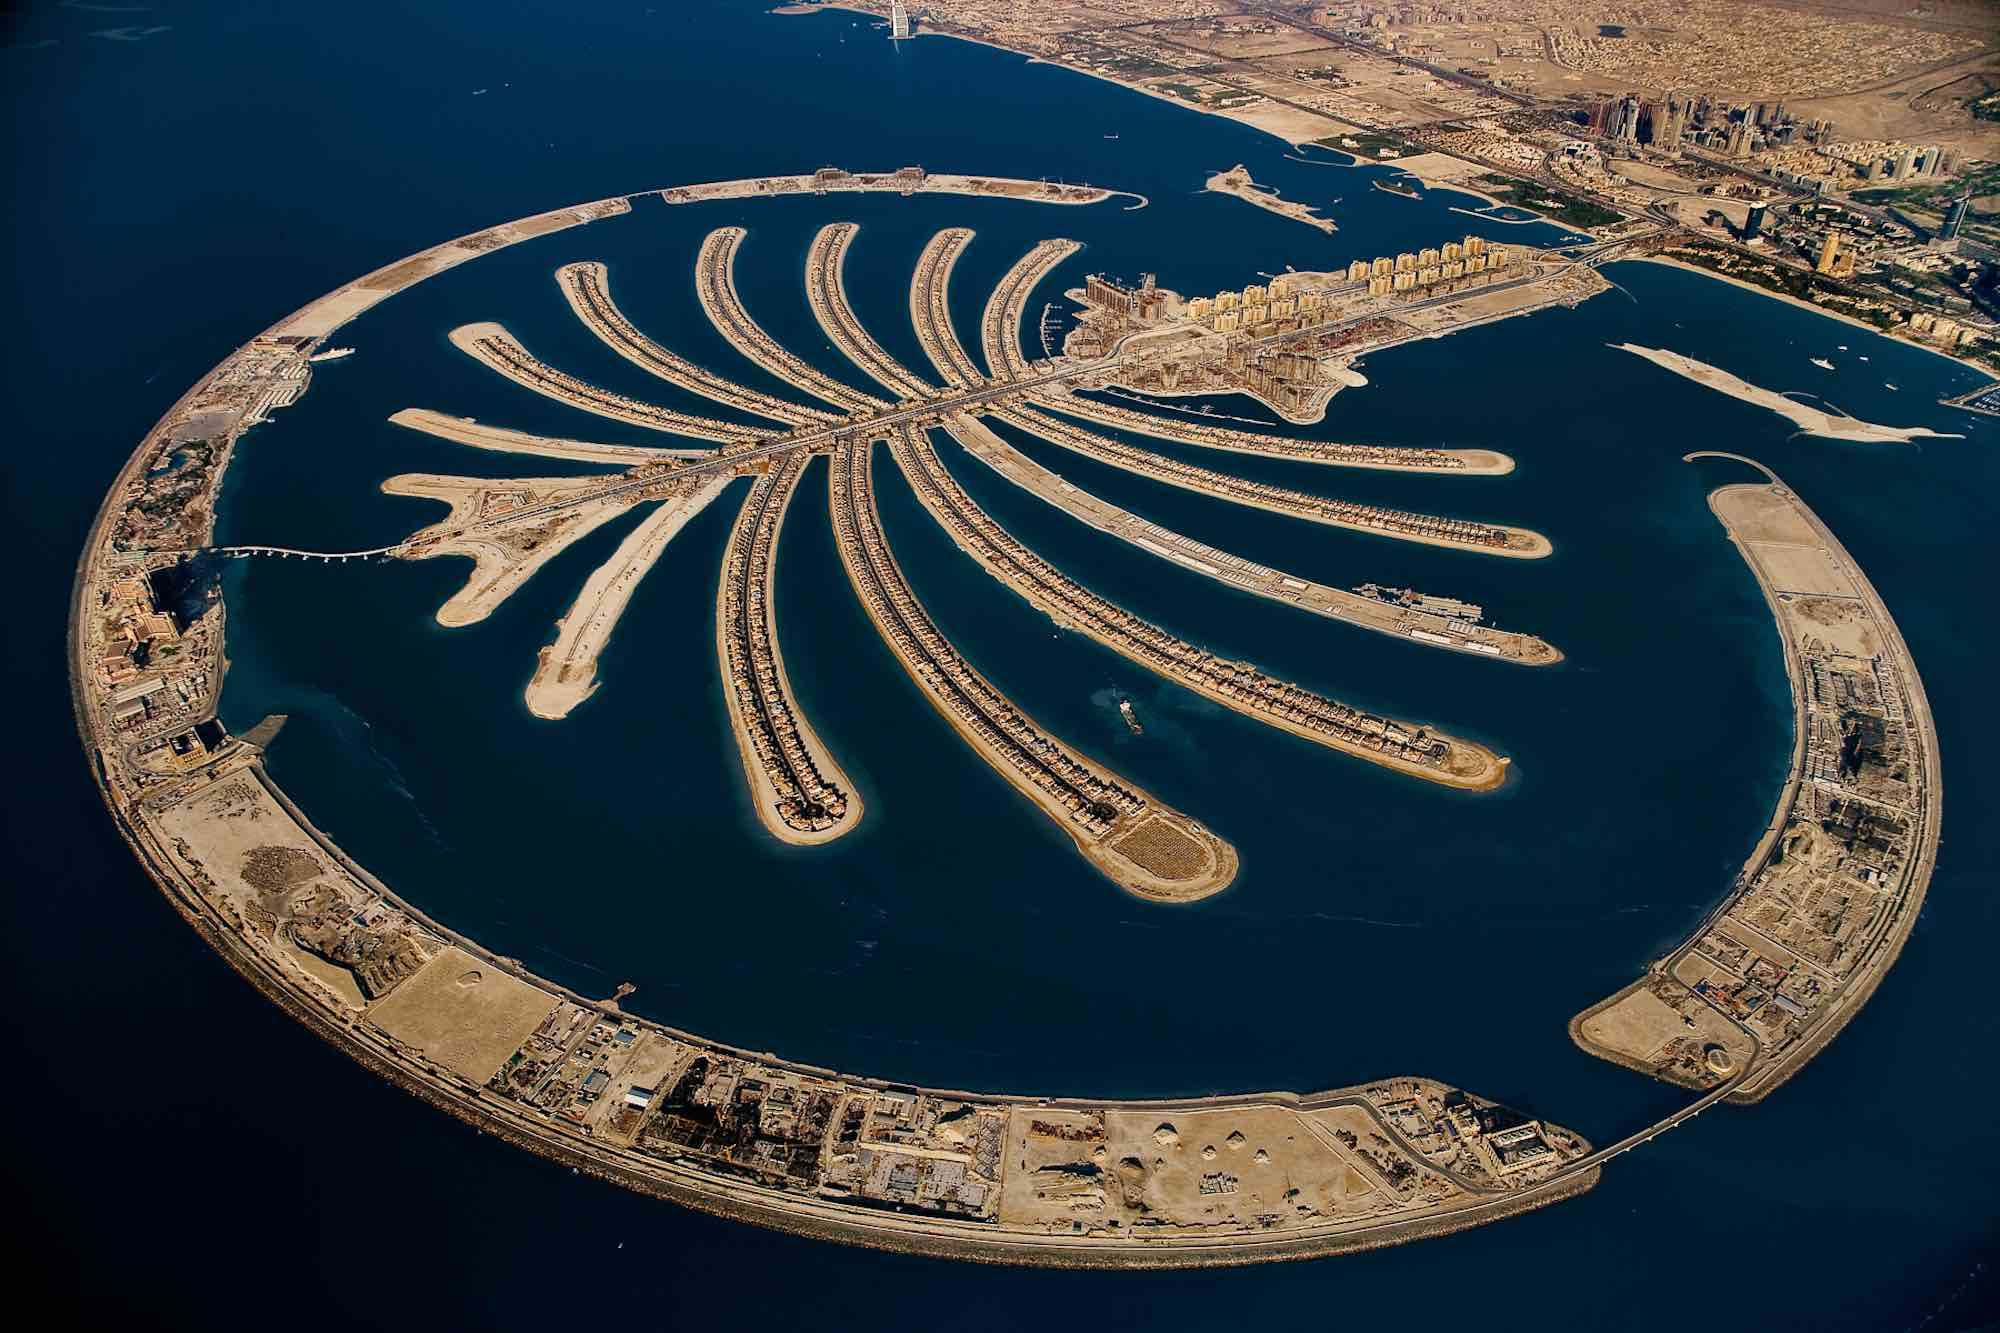 Artificial island - Yann Arthus-Bertrand